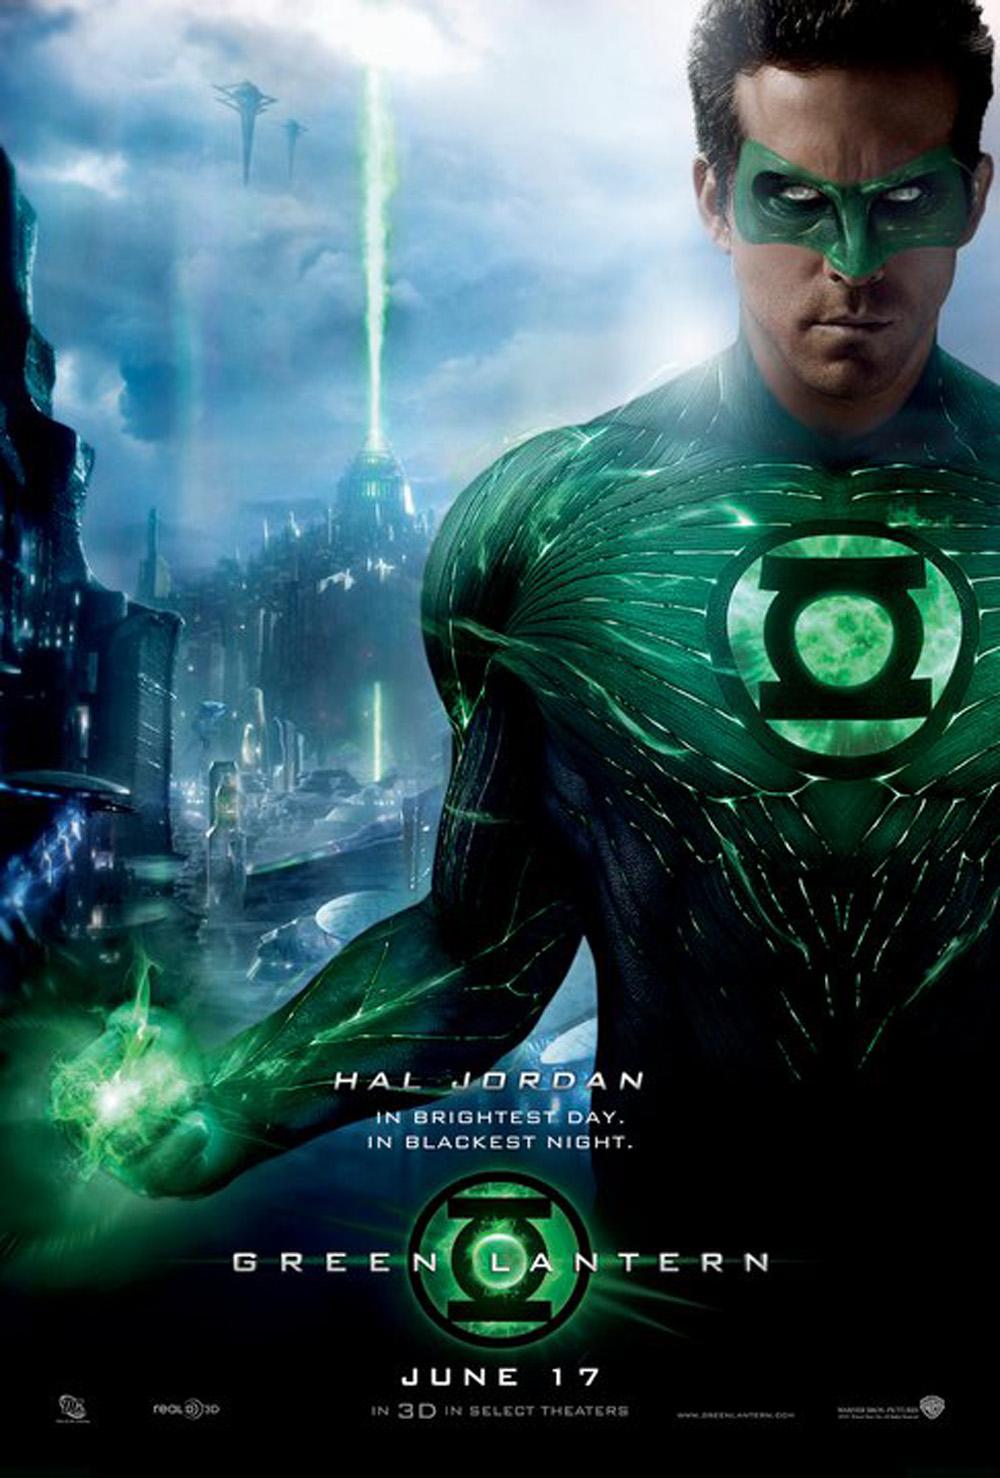 green_lantern_poster_2011_01.jpg